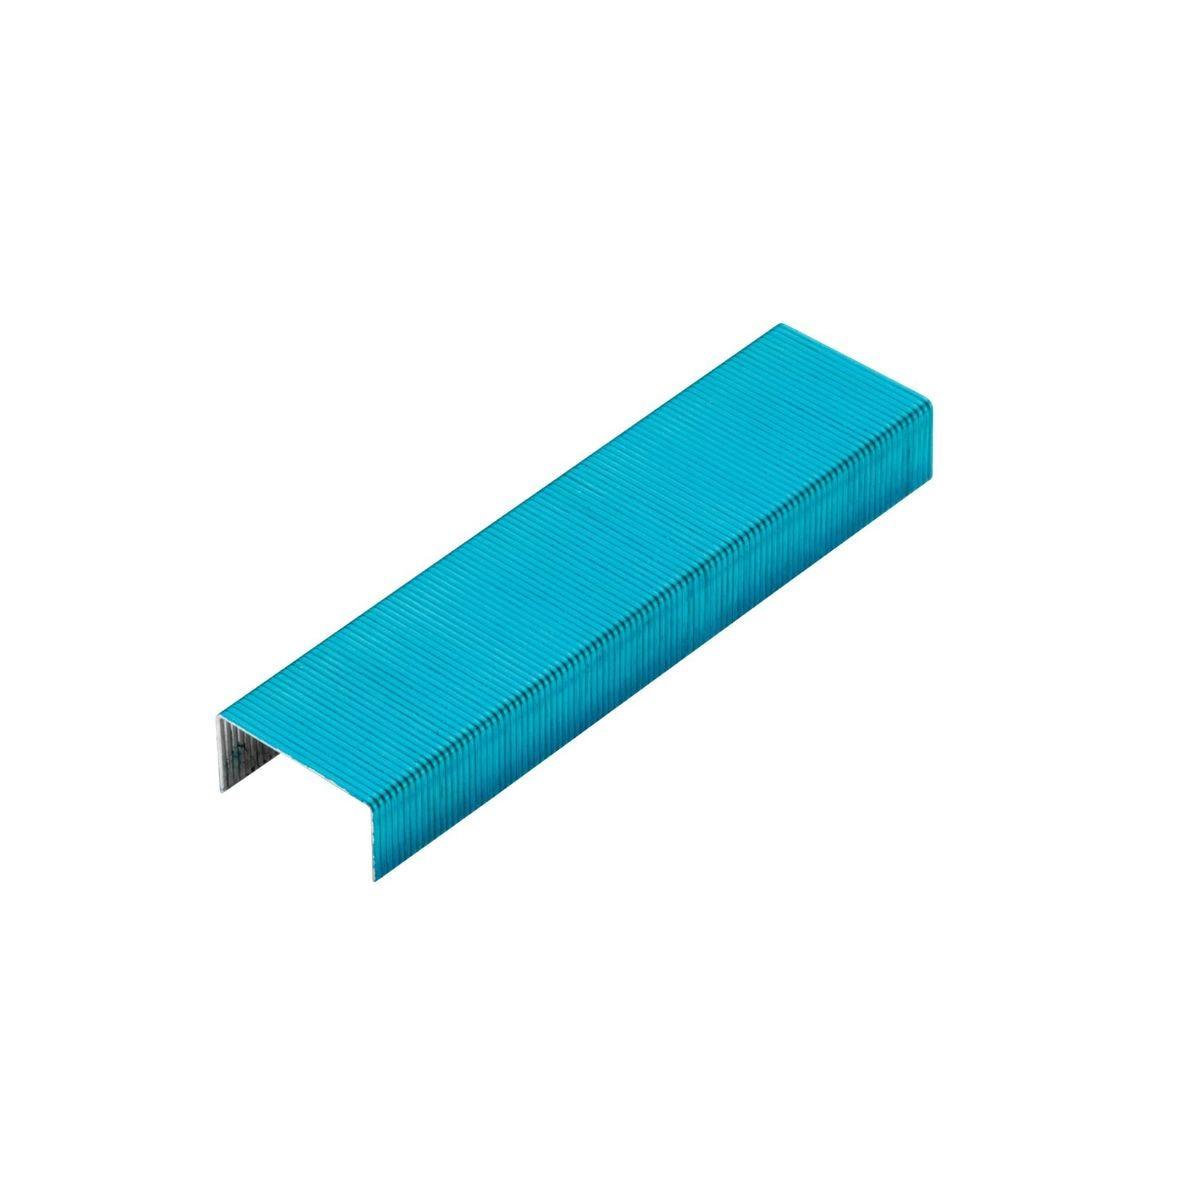 Staplers & Staples Desk Accessories Office Supplies - Ryman